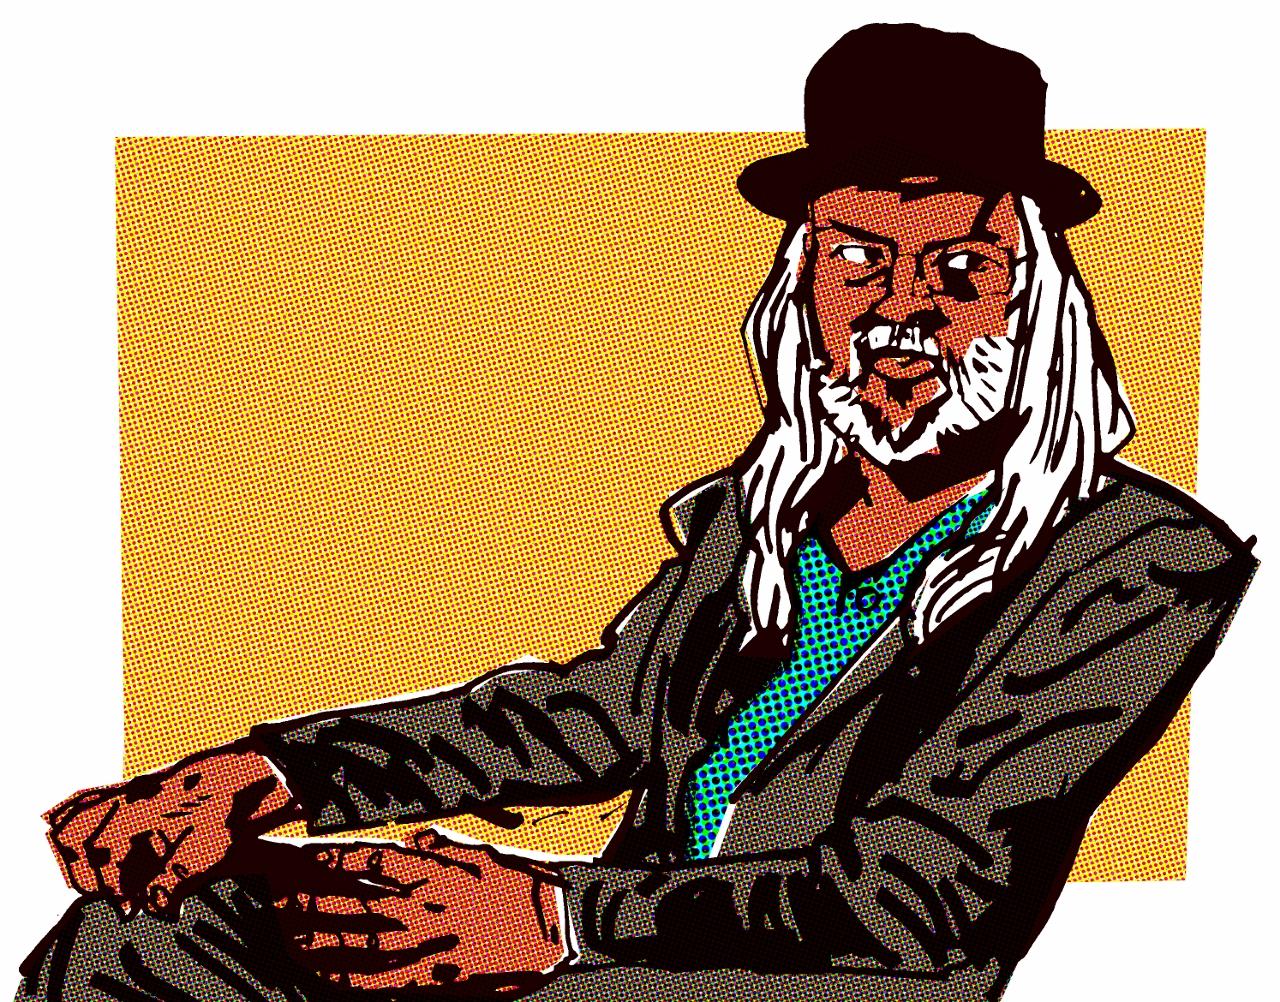 Grant Collinsworth, illustration by Oisin McGillion Hughes